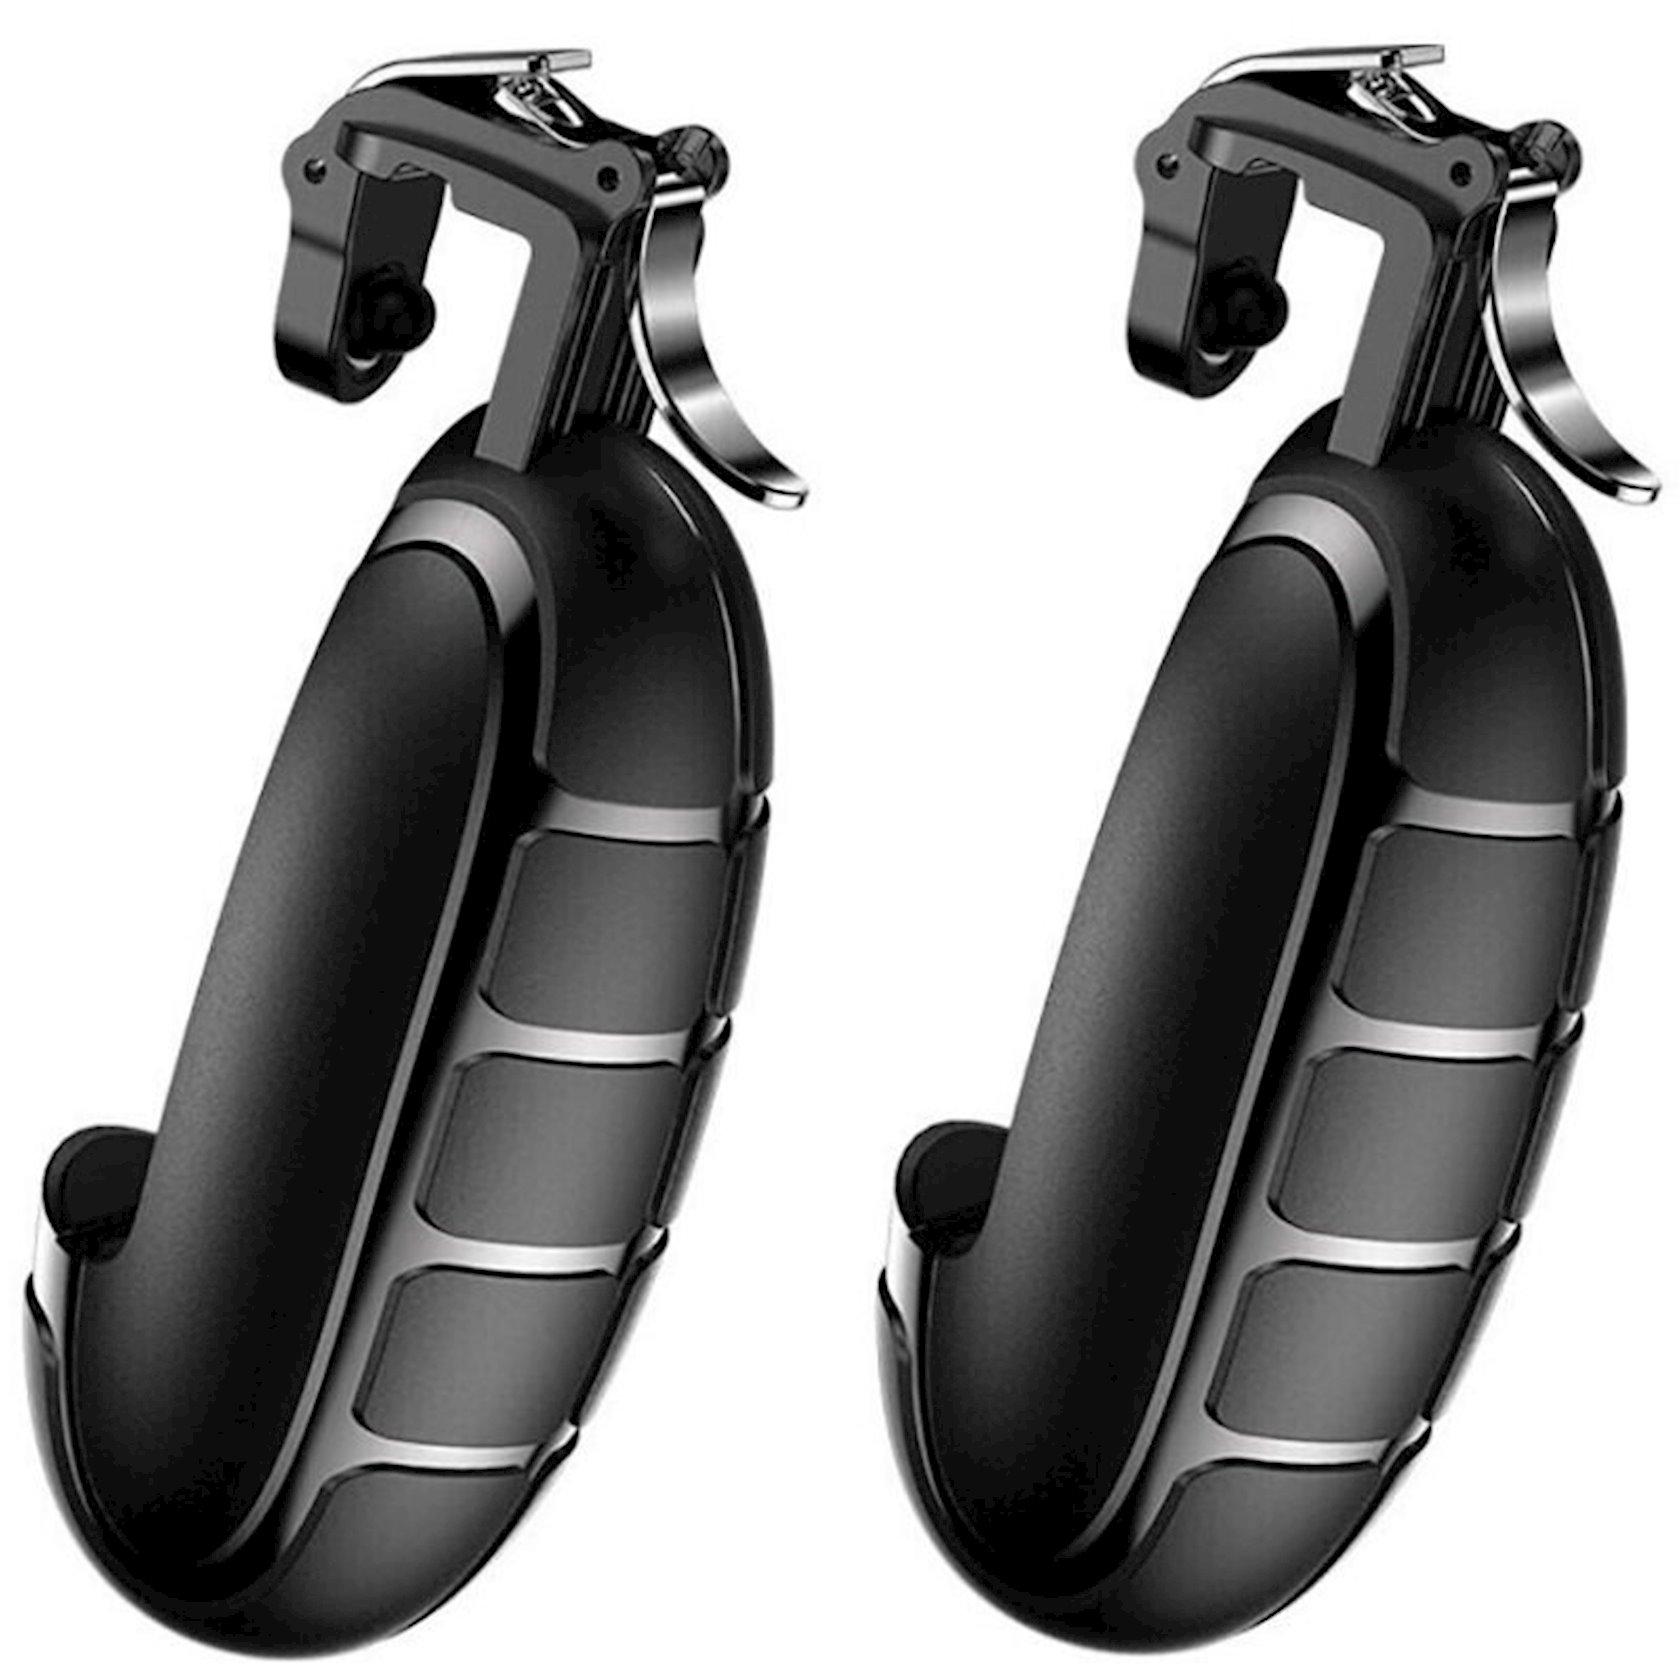 Qeympad triqqer smartfon üçün Baseus Grenade Handle